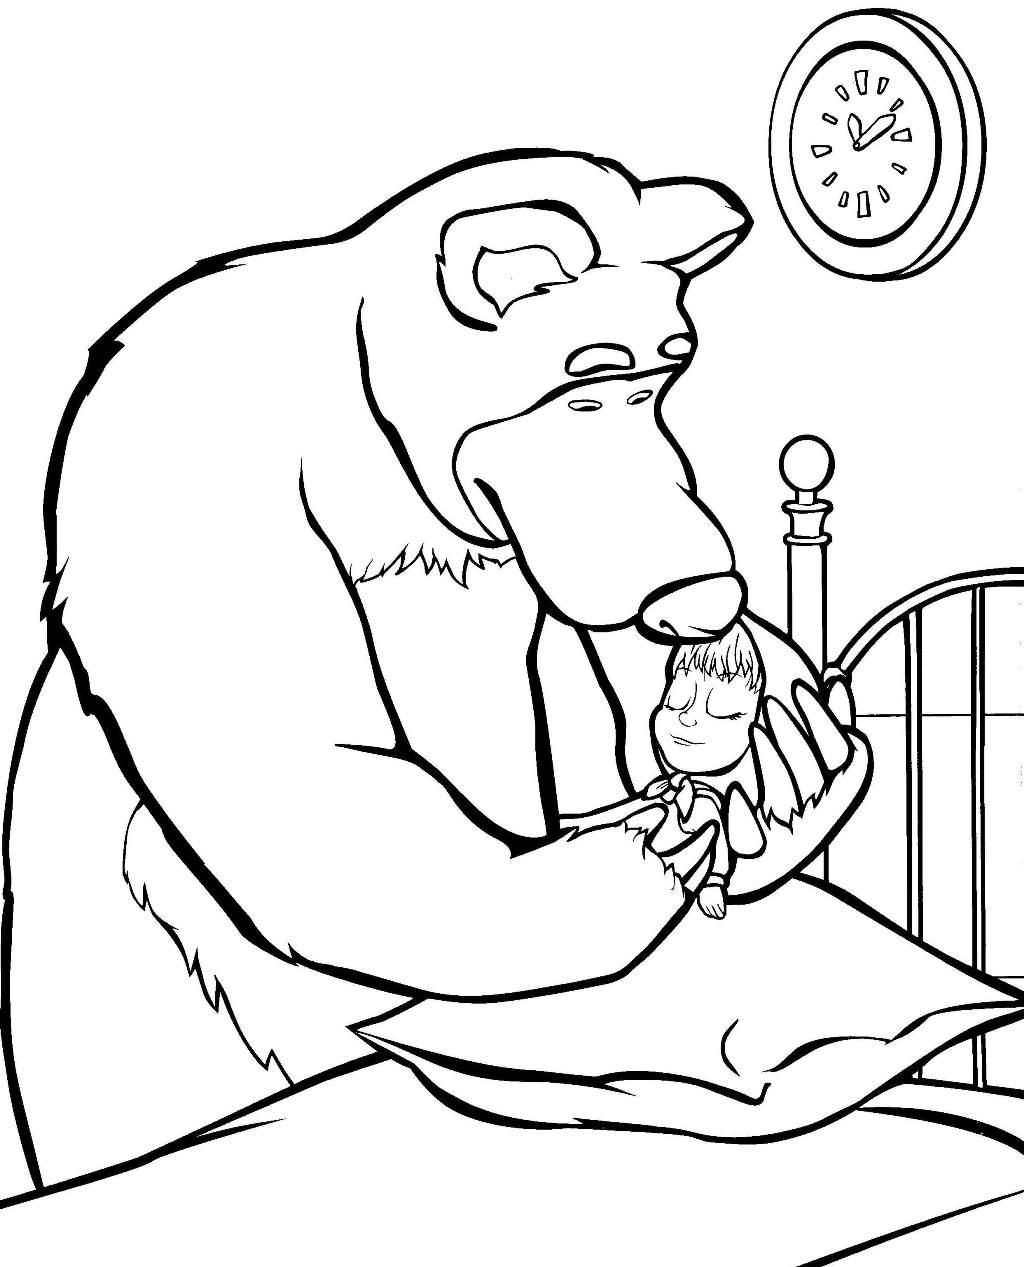 Раскраска медведь 2